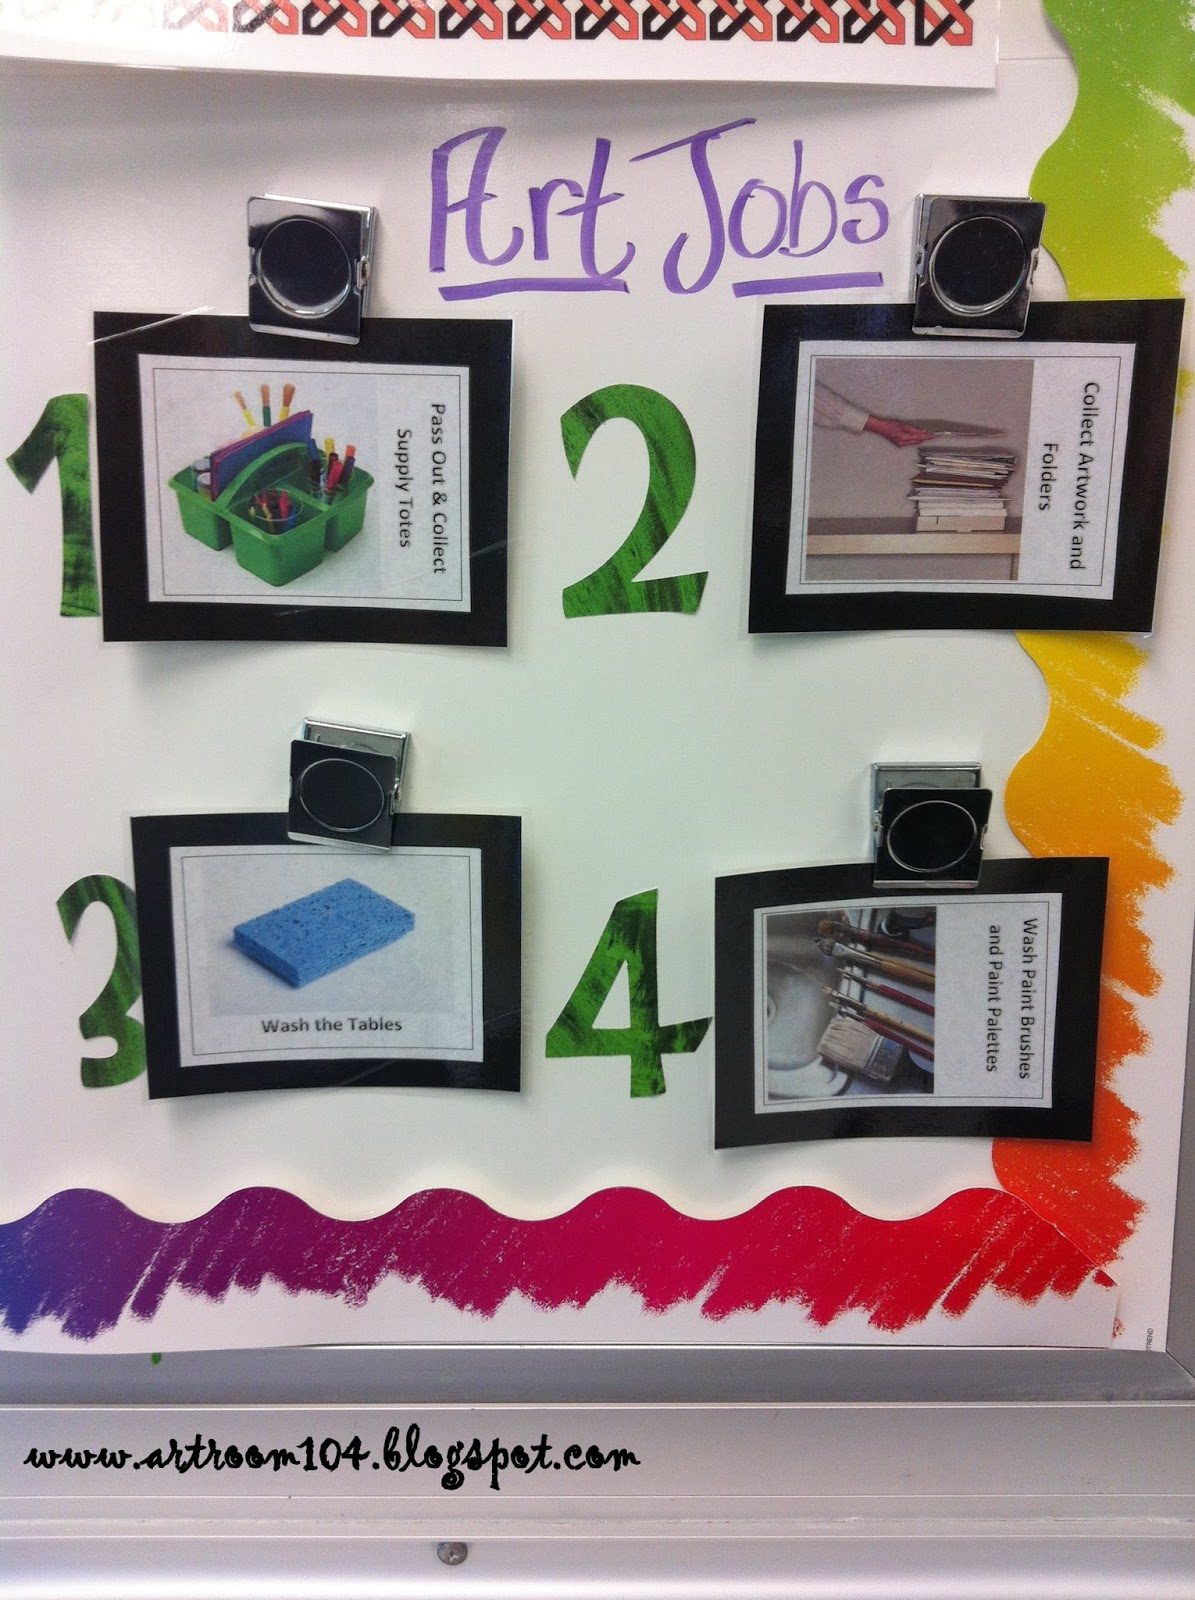 Art Room 104 High School Art Room Rules Amp Objectives Boards